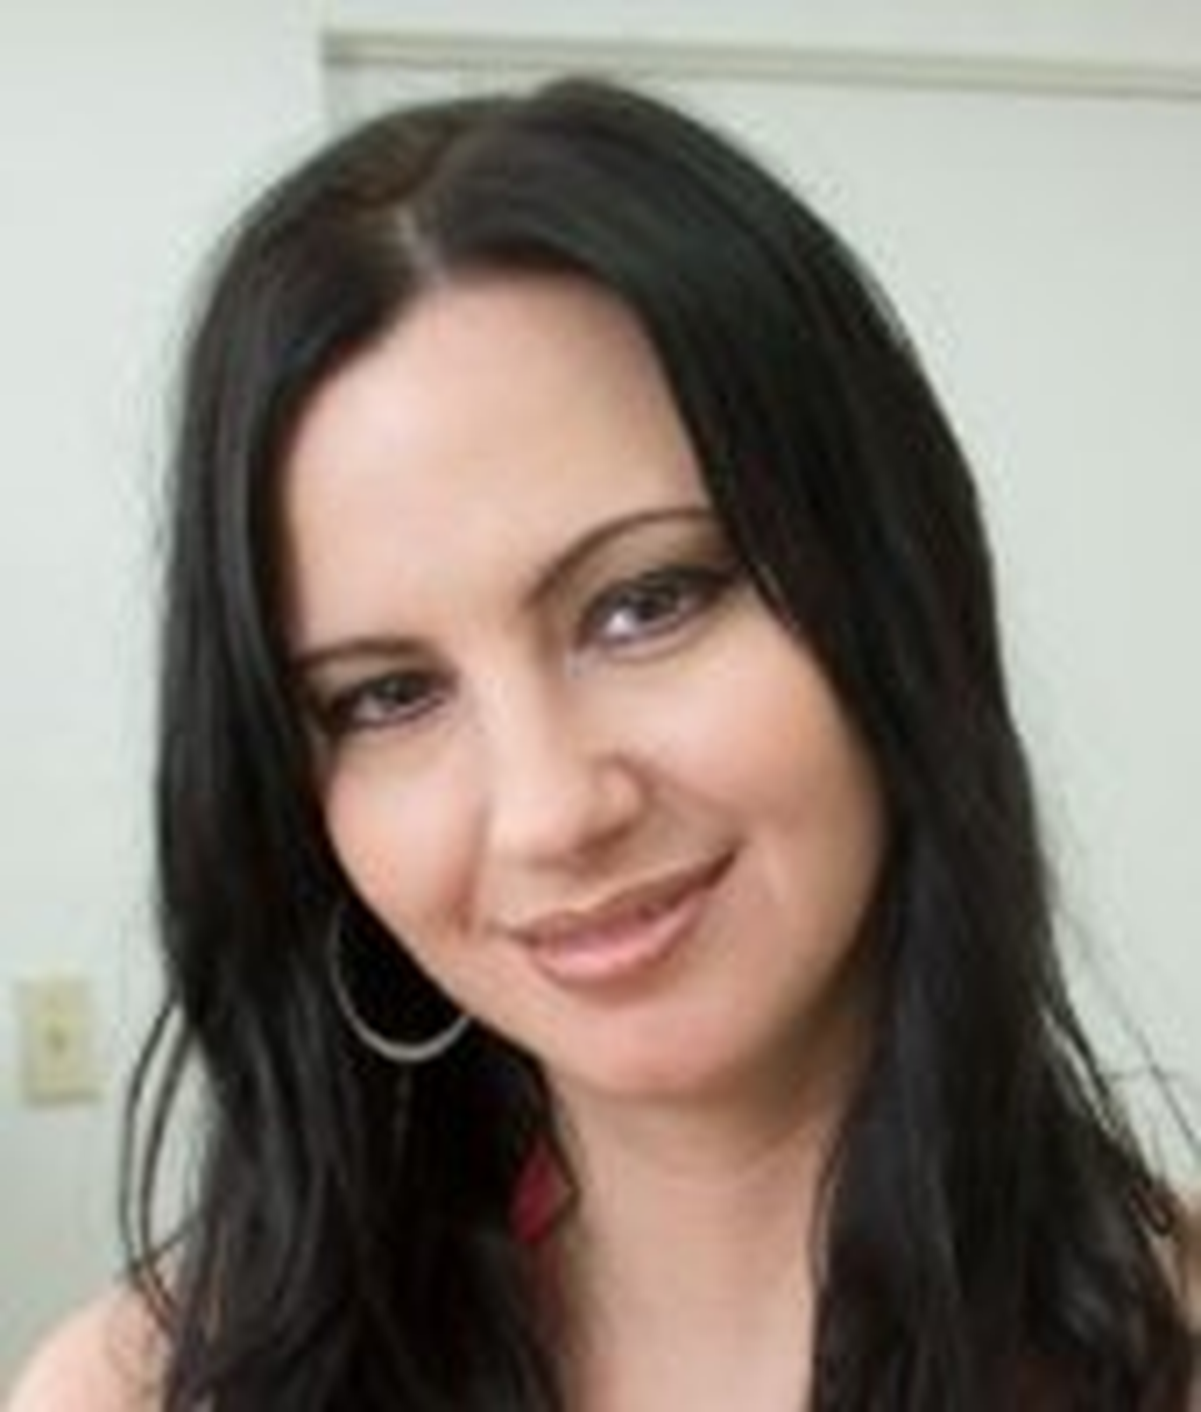 Krista Kaslo